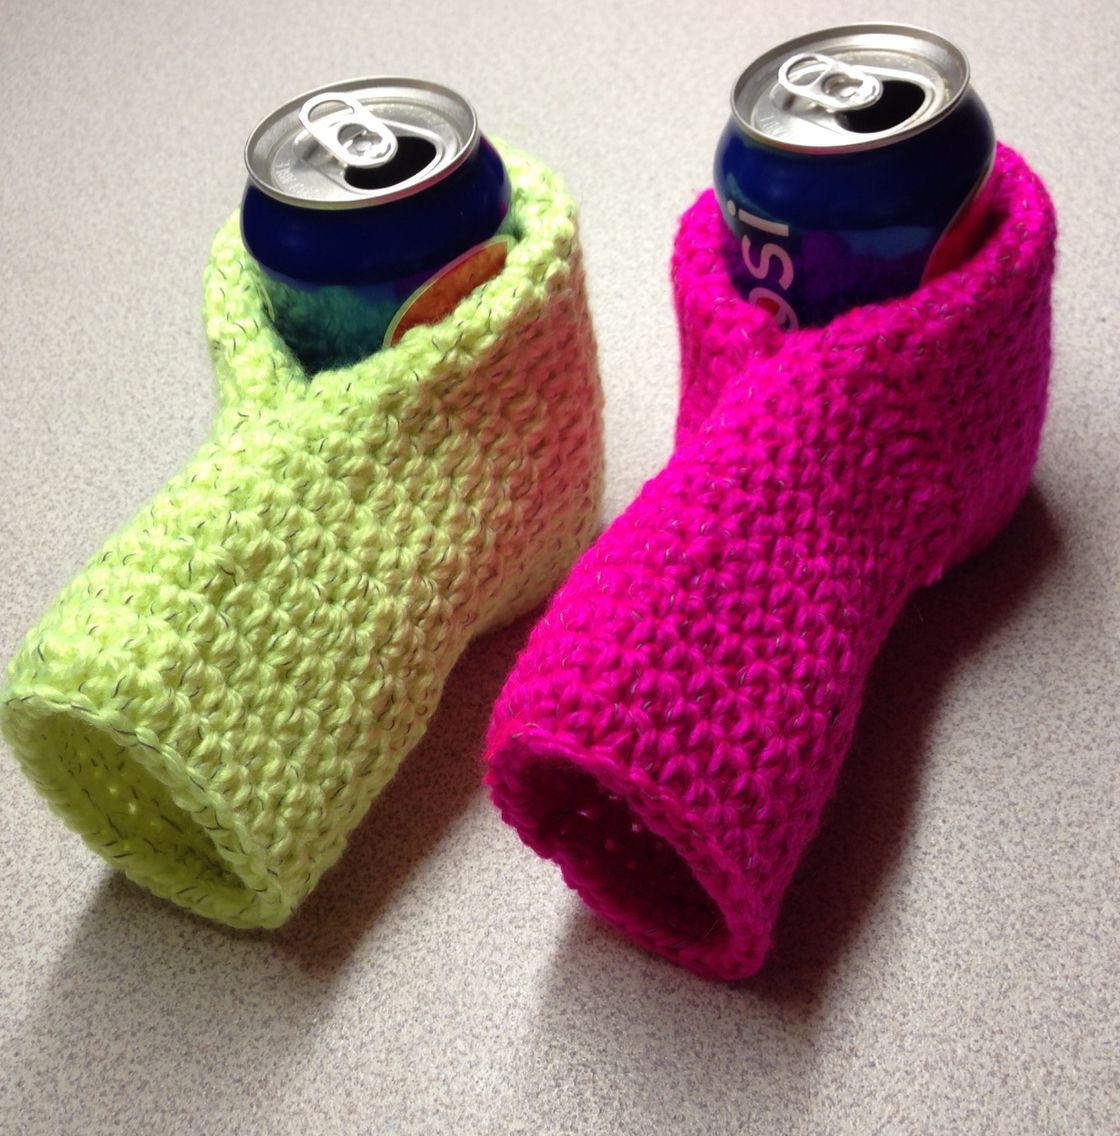 Reflective Beer/Hot drink mitts | Crochet-cup cozy | Pinterest ...